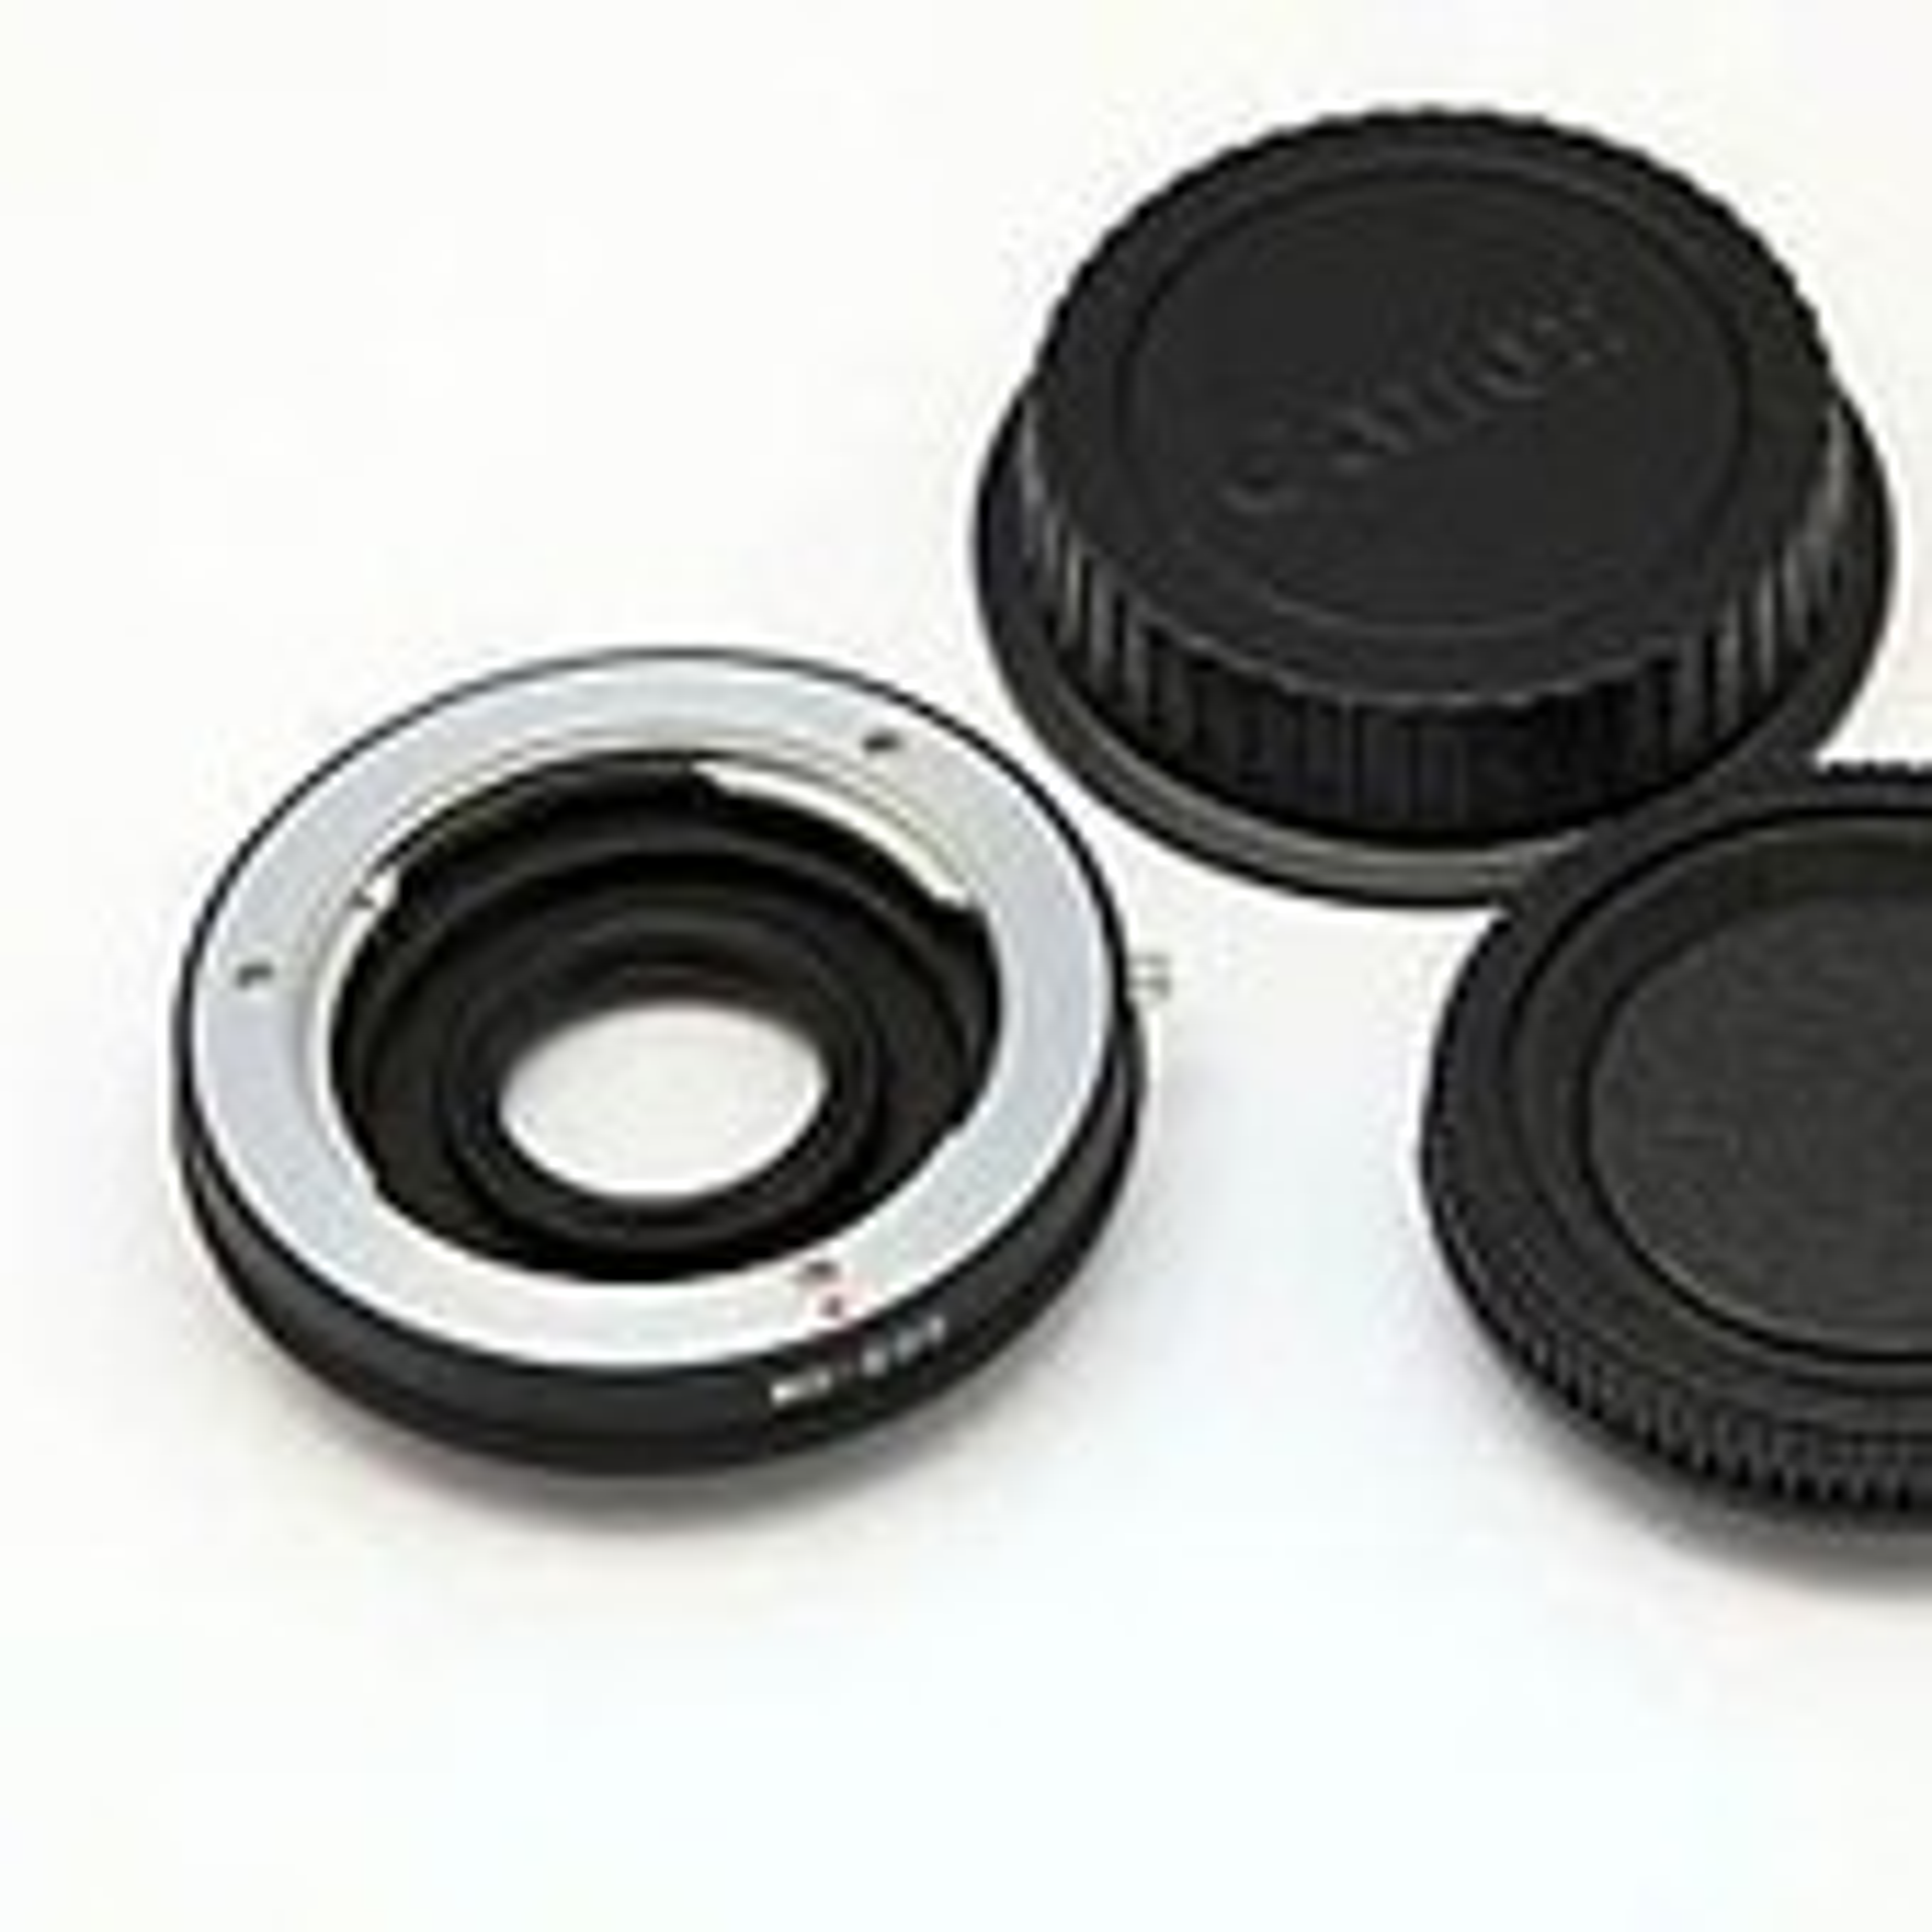 Bague d'Adaptation Minolta SR/MD/MC vers Canon EOS/EF Boitier